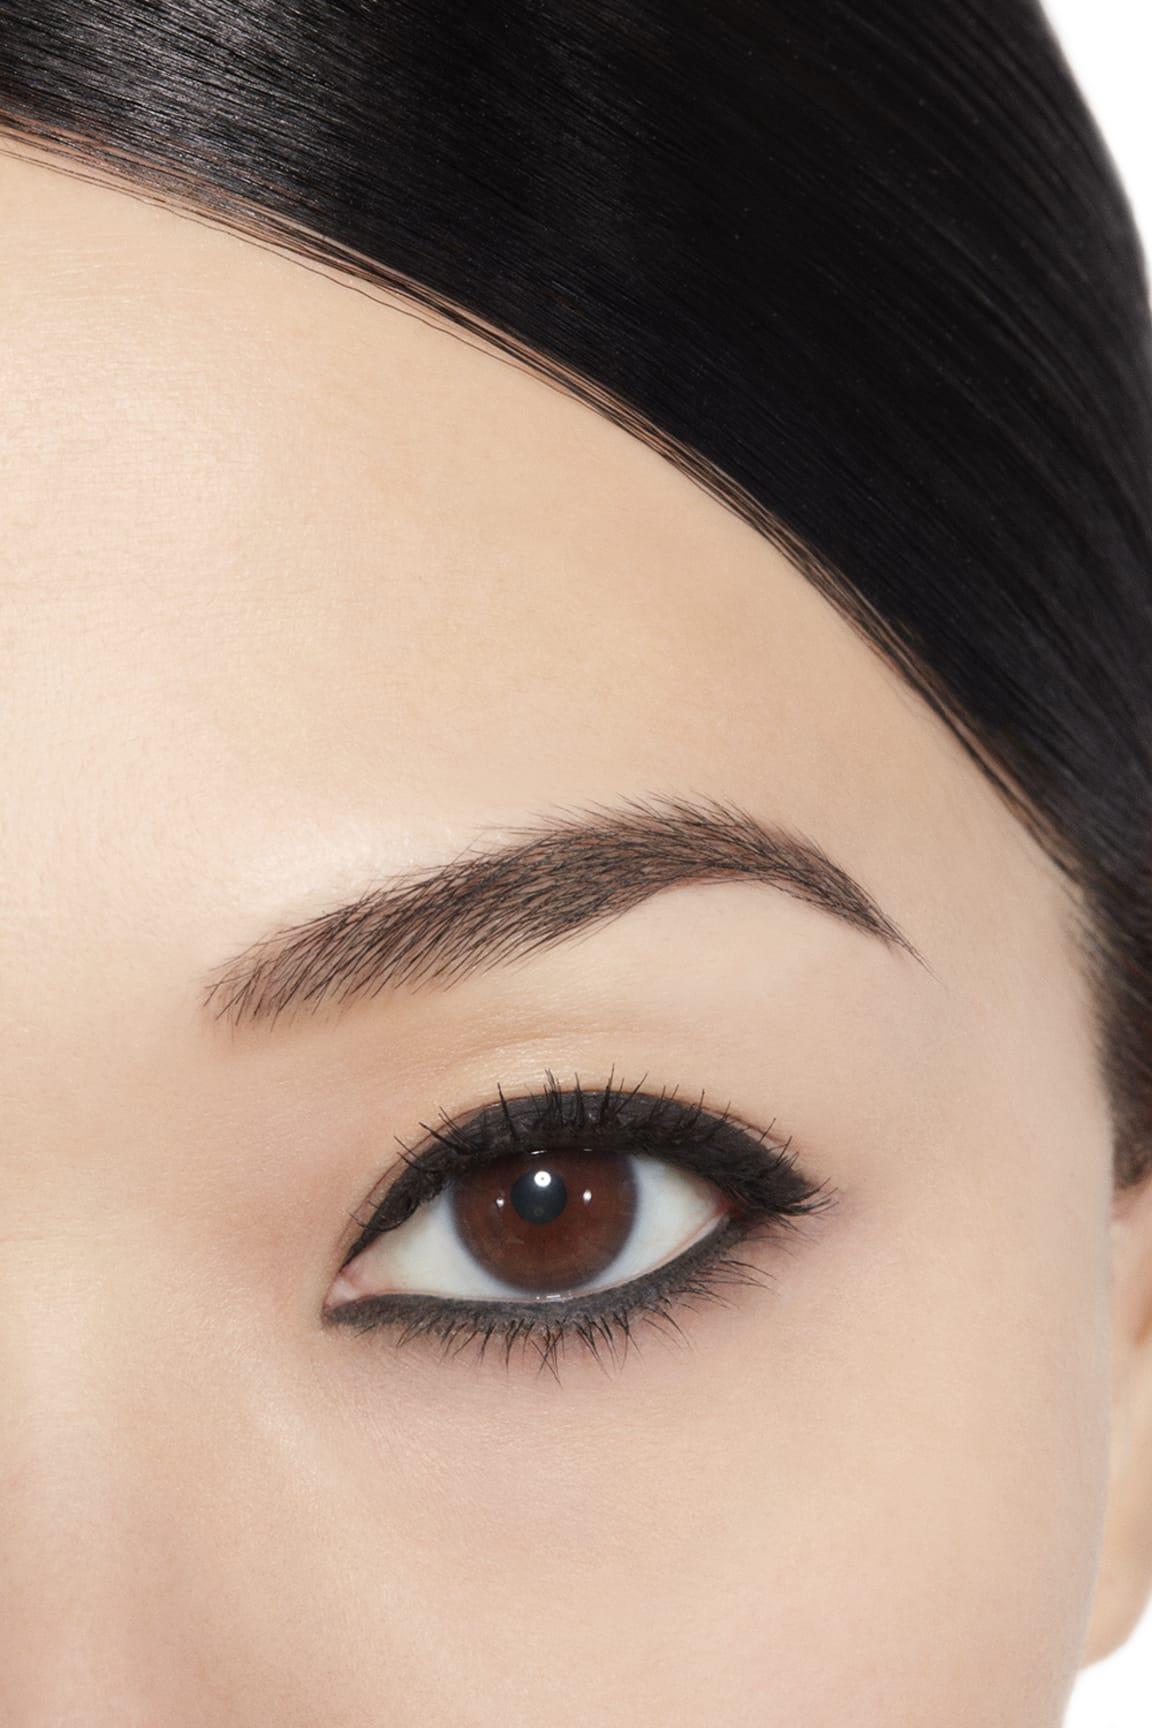 Application makeup visual 1 - STYLO YEUX WATERPROOF 10 - ÉBÈNE